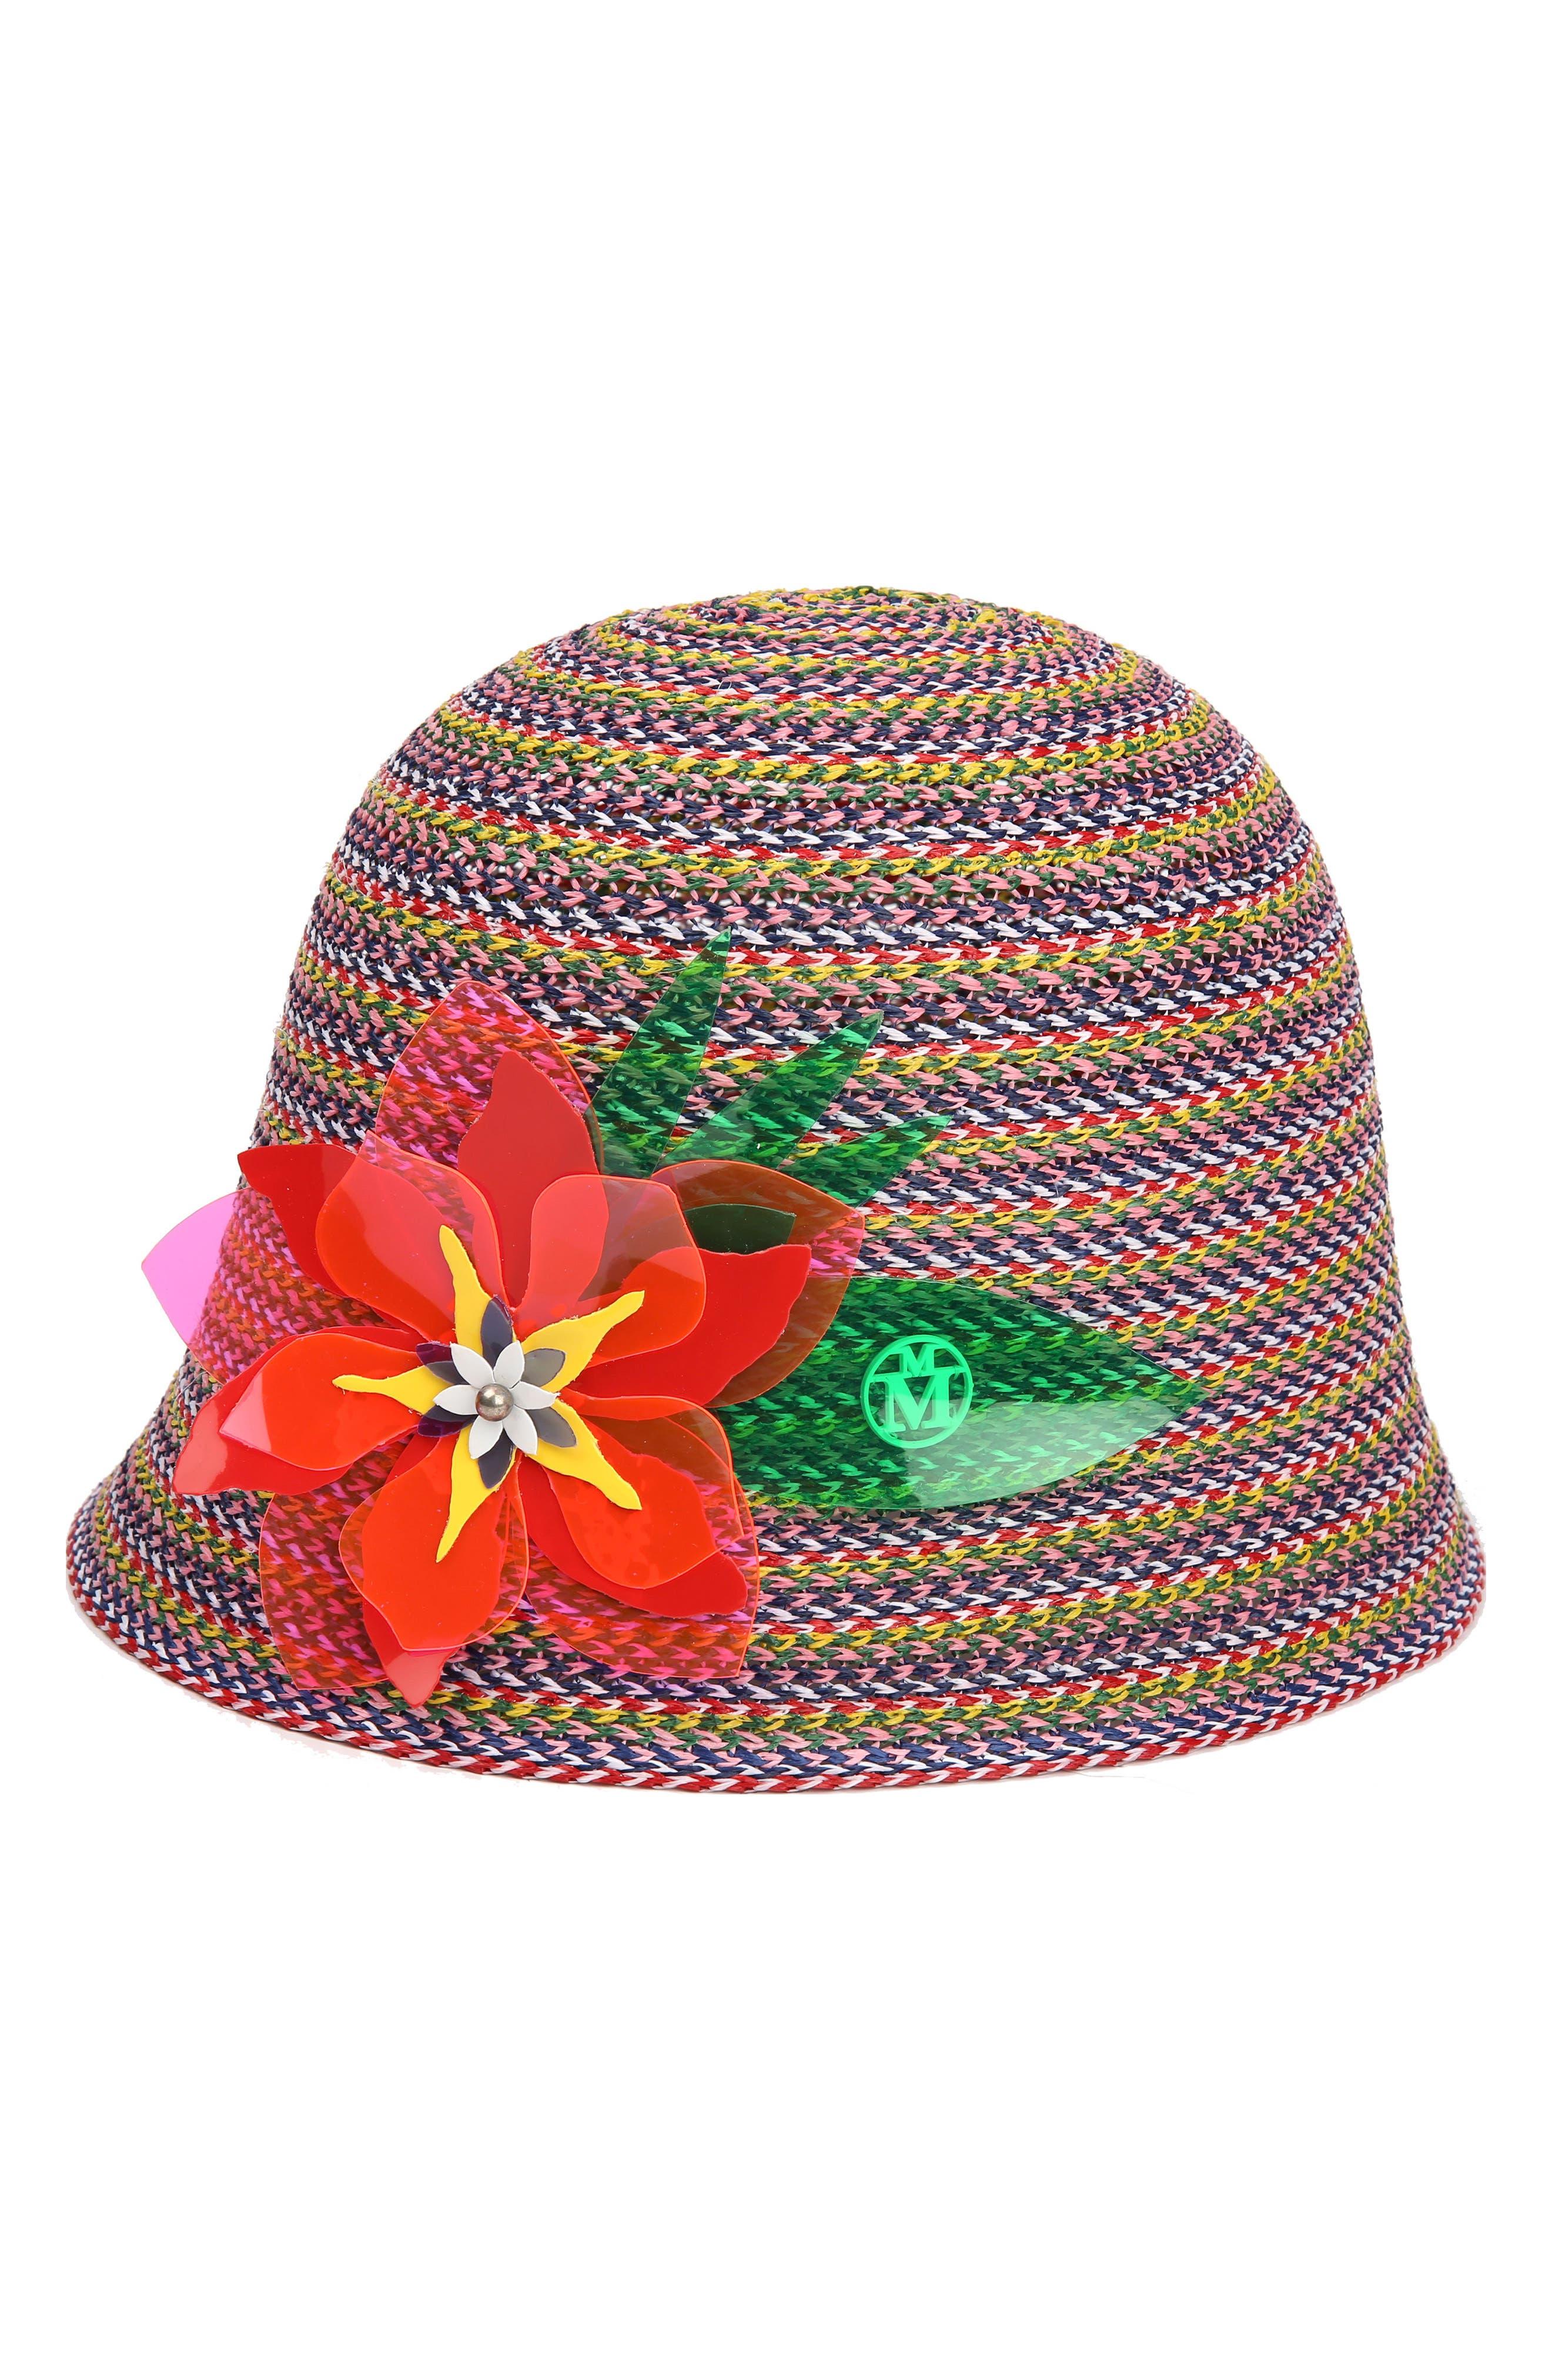 Maison Michel Jin Multicolor Straw Hat